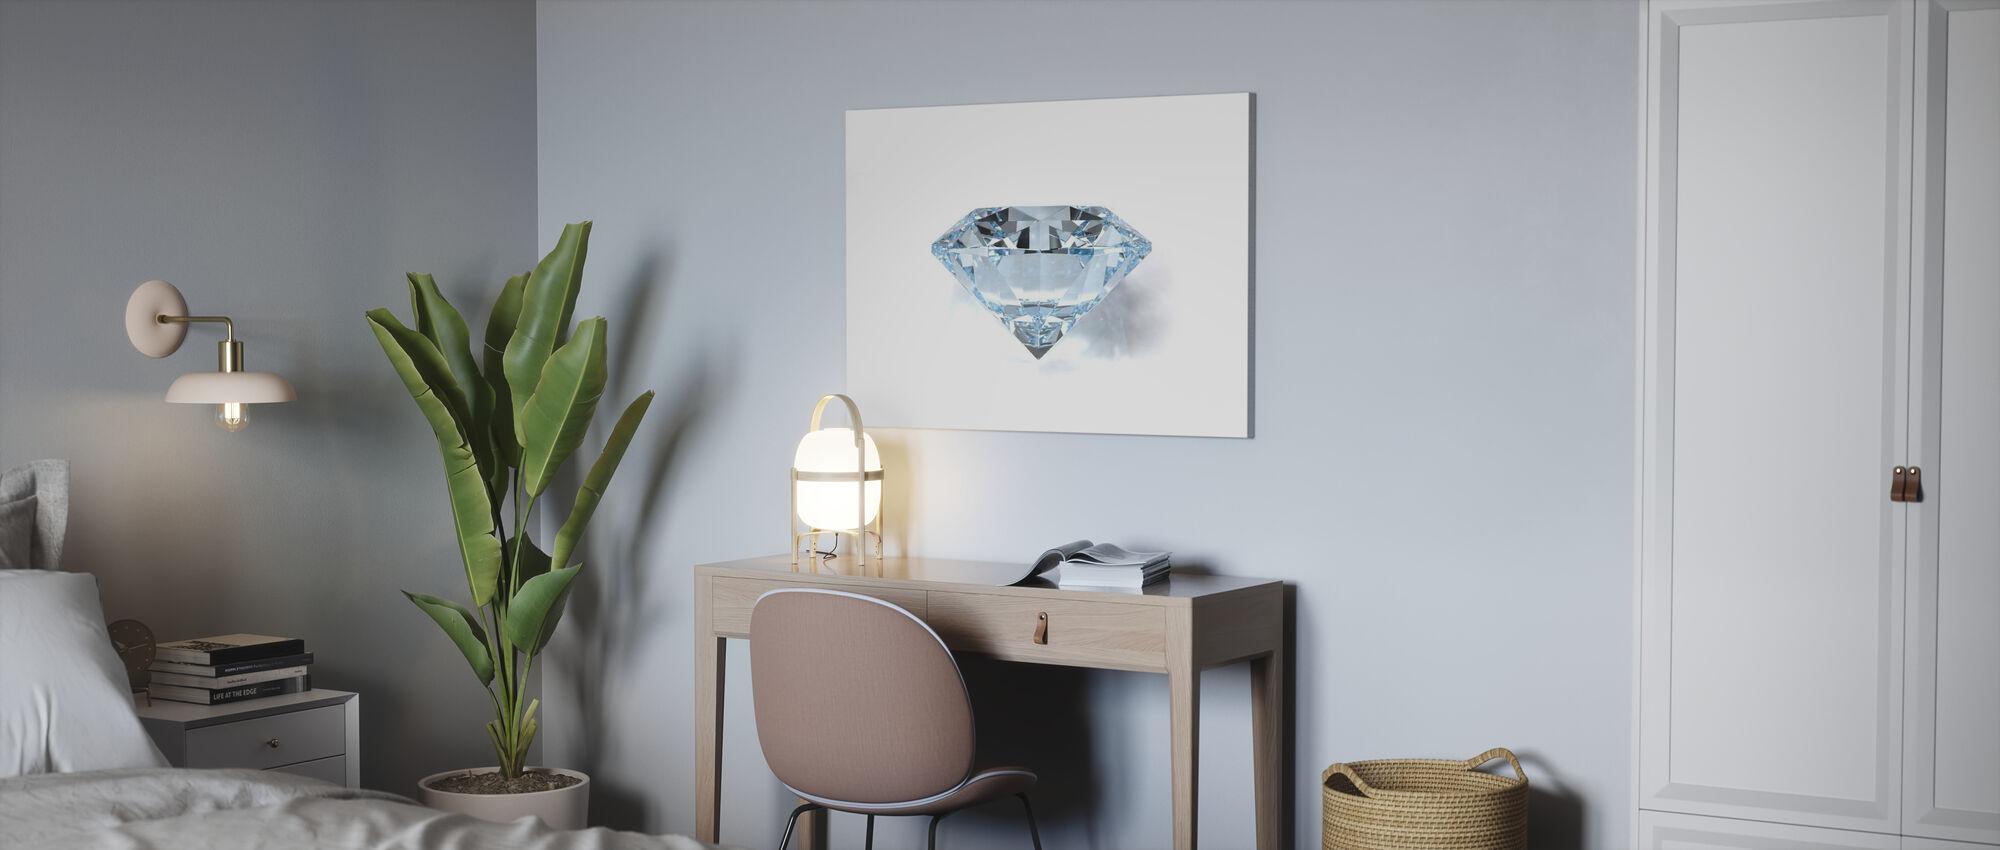 Diamant - Canvastavla - Kontor